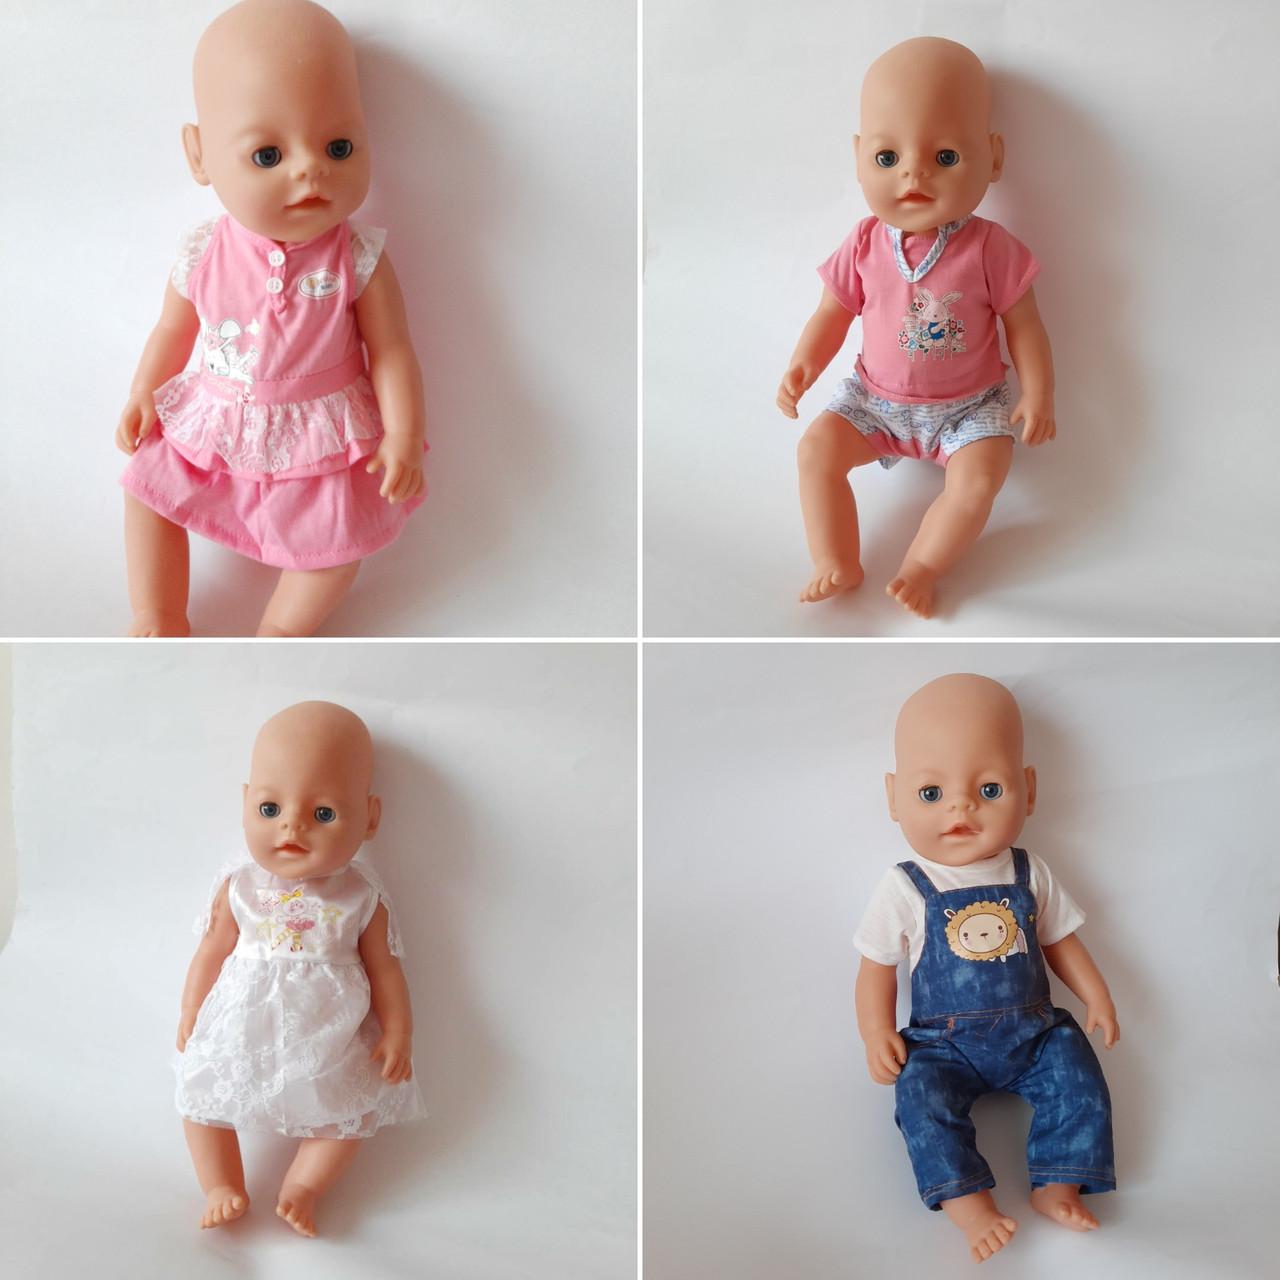 DBJ-432-5-9-43,Одежда для кукол, Аксессуары для кукол,Аксессуары для кукол и пупсов, Одежда для пупсов, Кукольная одежда, Одежда для беби борн, Одежда